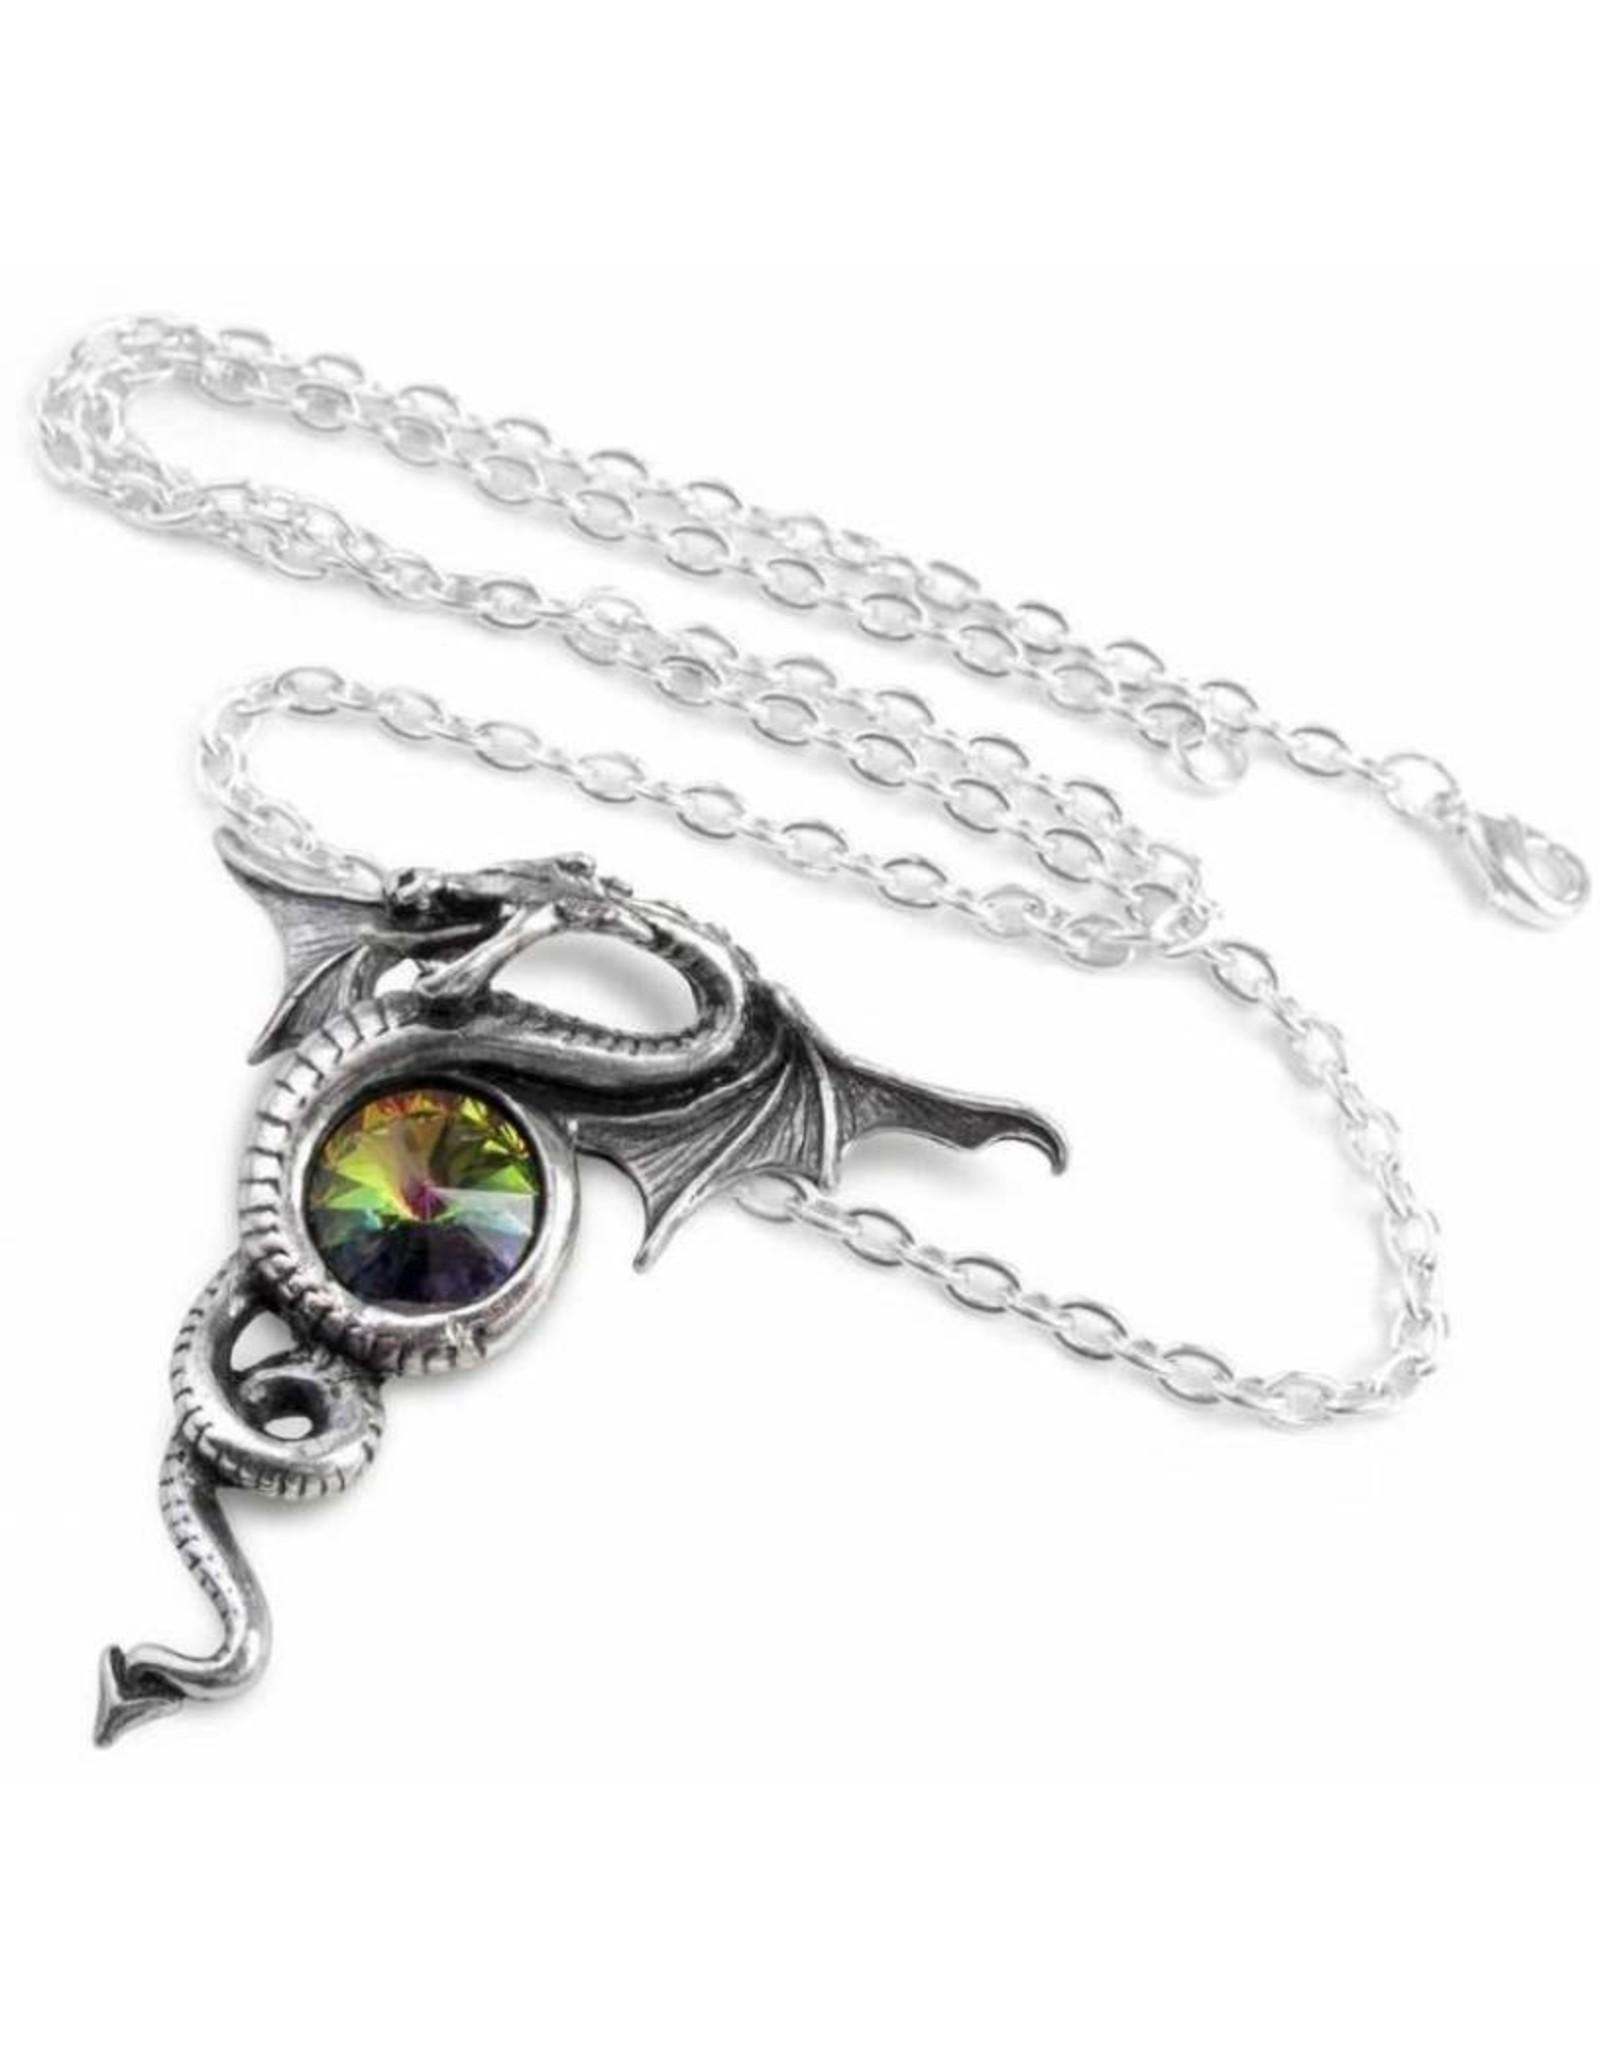 Alchemy Gothic jewellery Steampunk jewellery - Anguis Aeternus Dragon necklace with green crystal - Alchemy